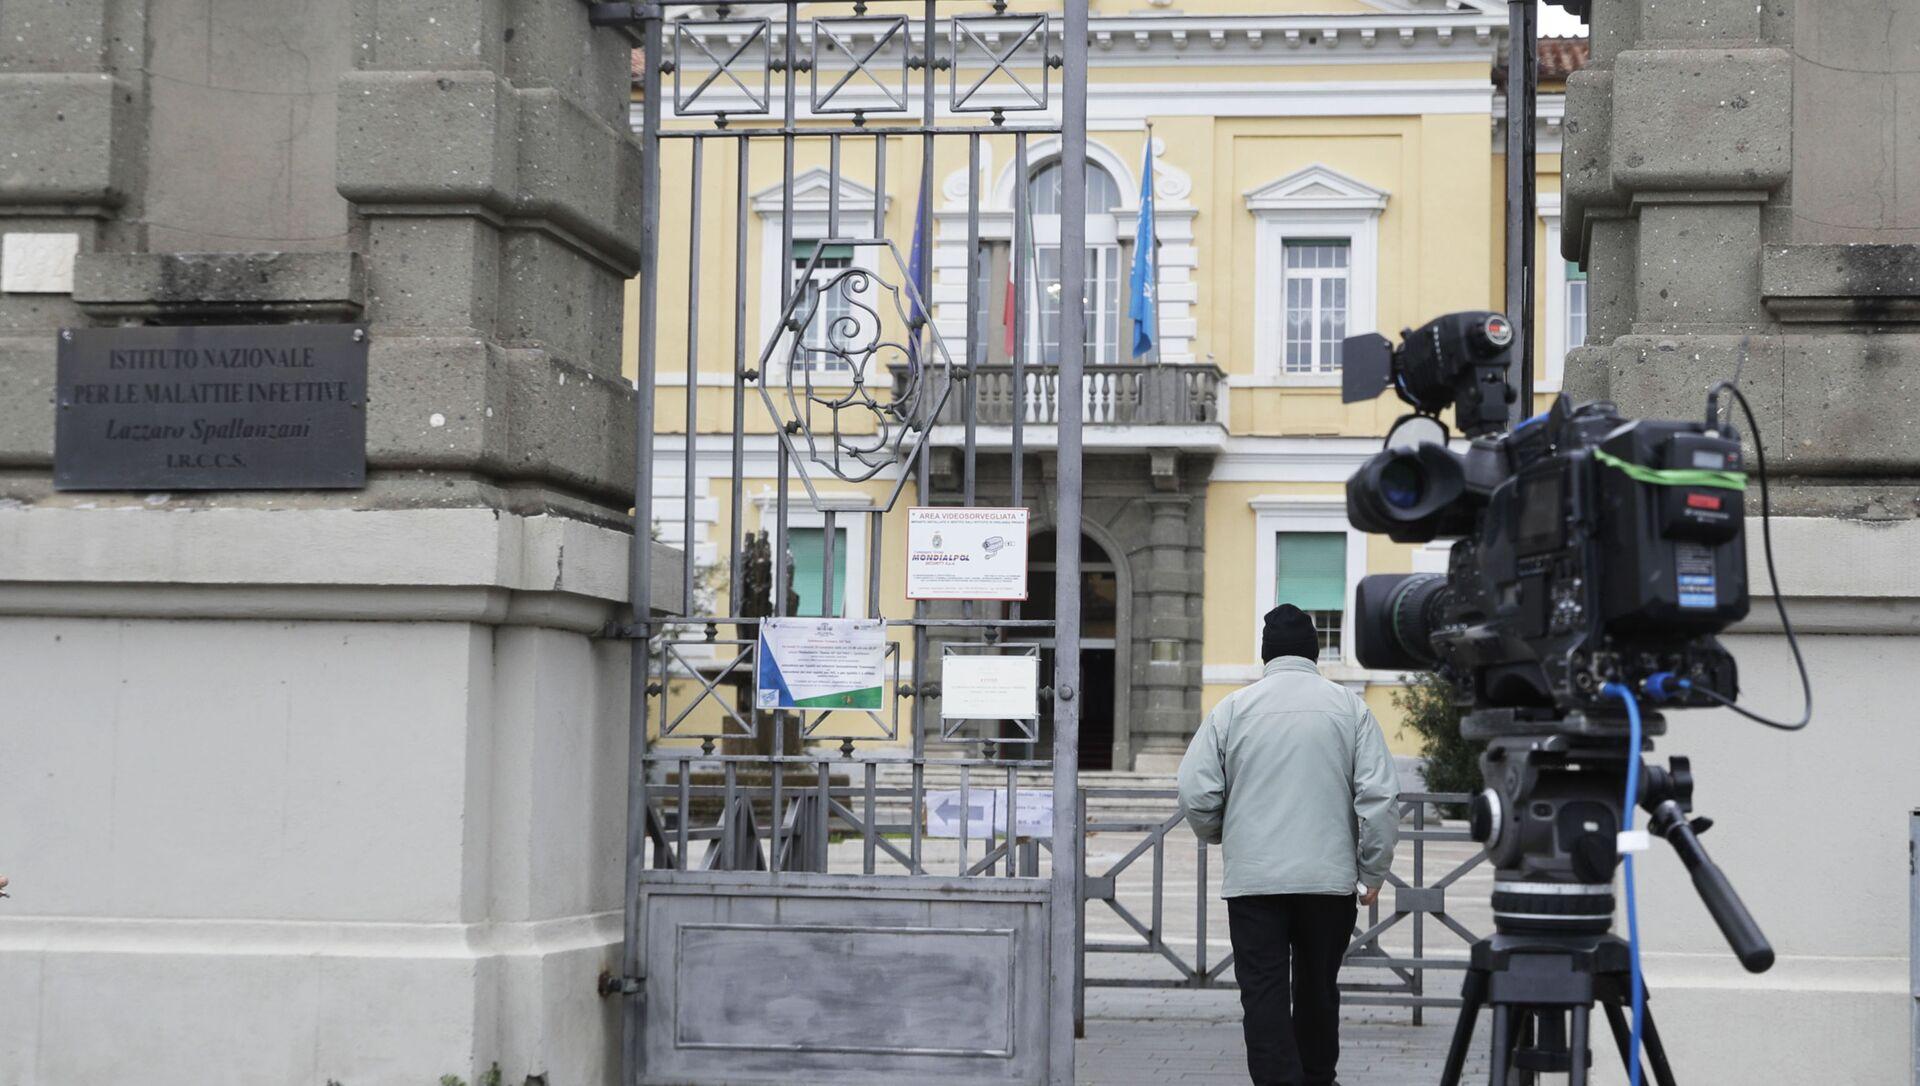 Камера в Риме, Италия - Sputnik Азербайджан, 1920, 07.04.2021